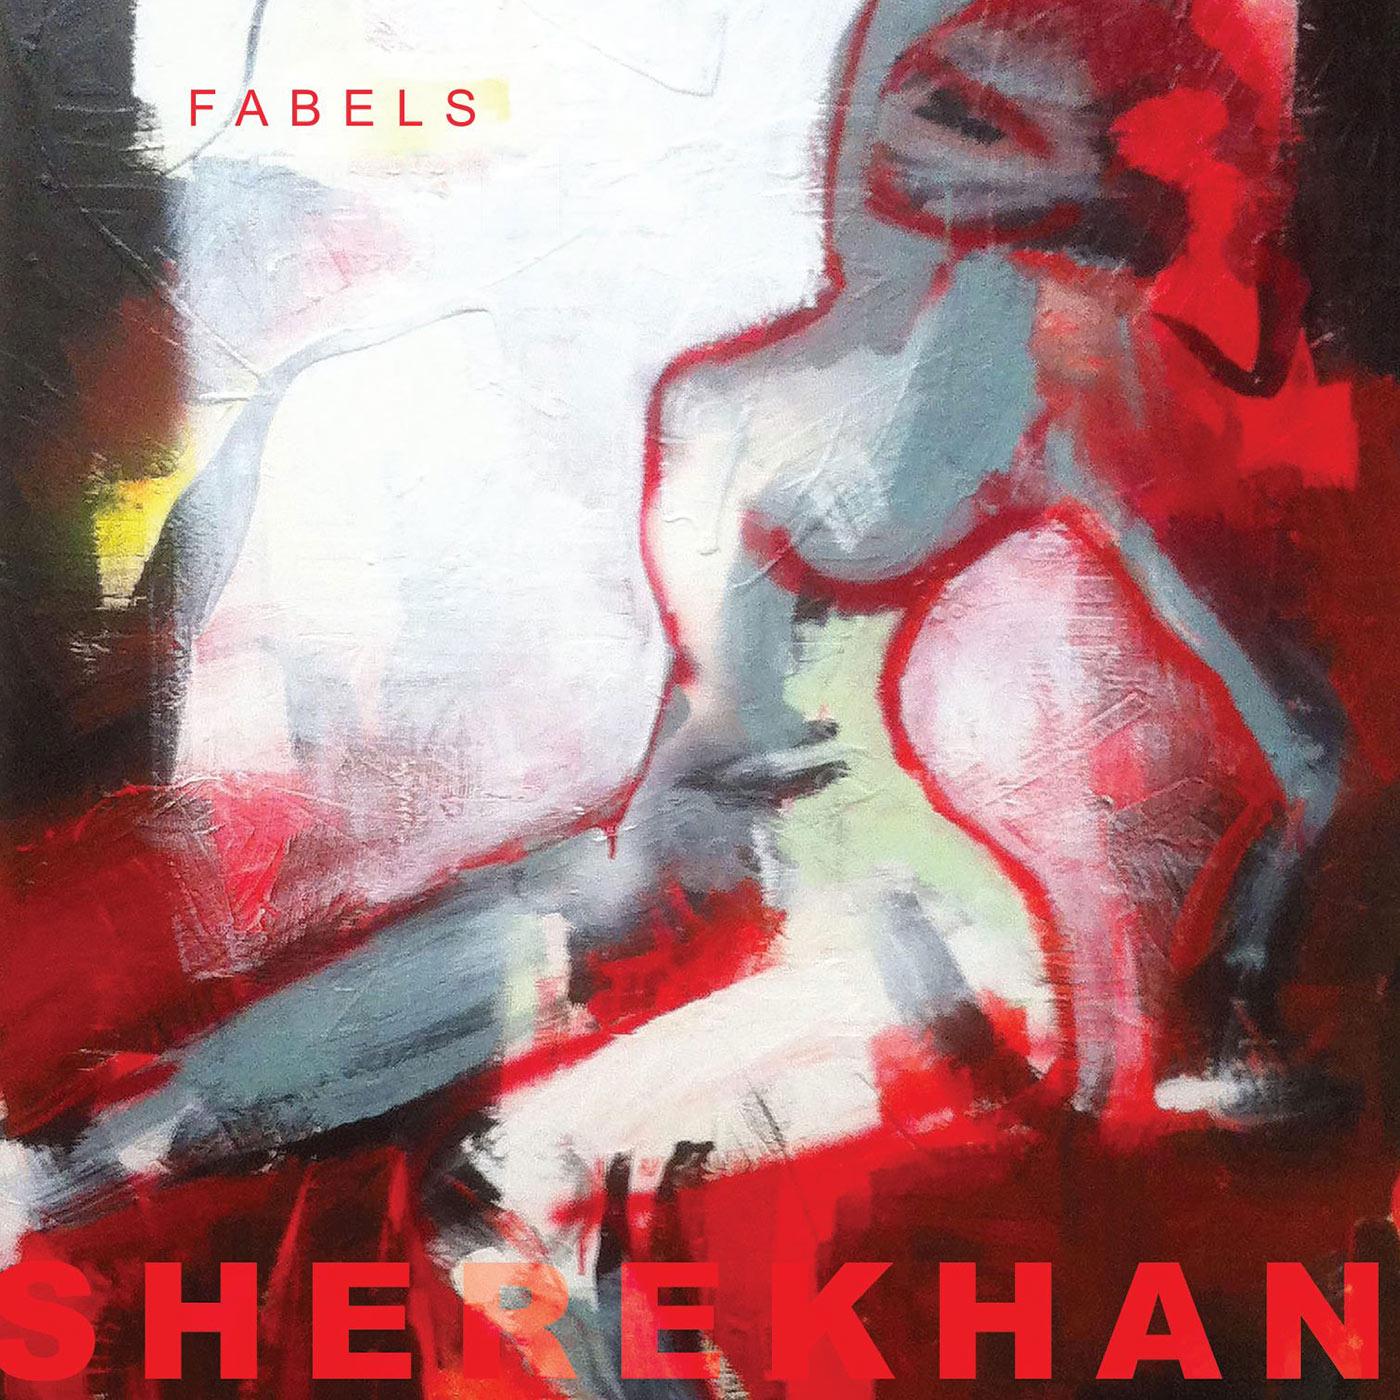 Fabels - ShereKhan